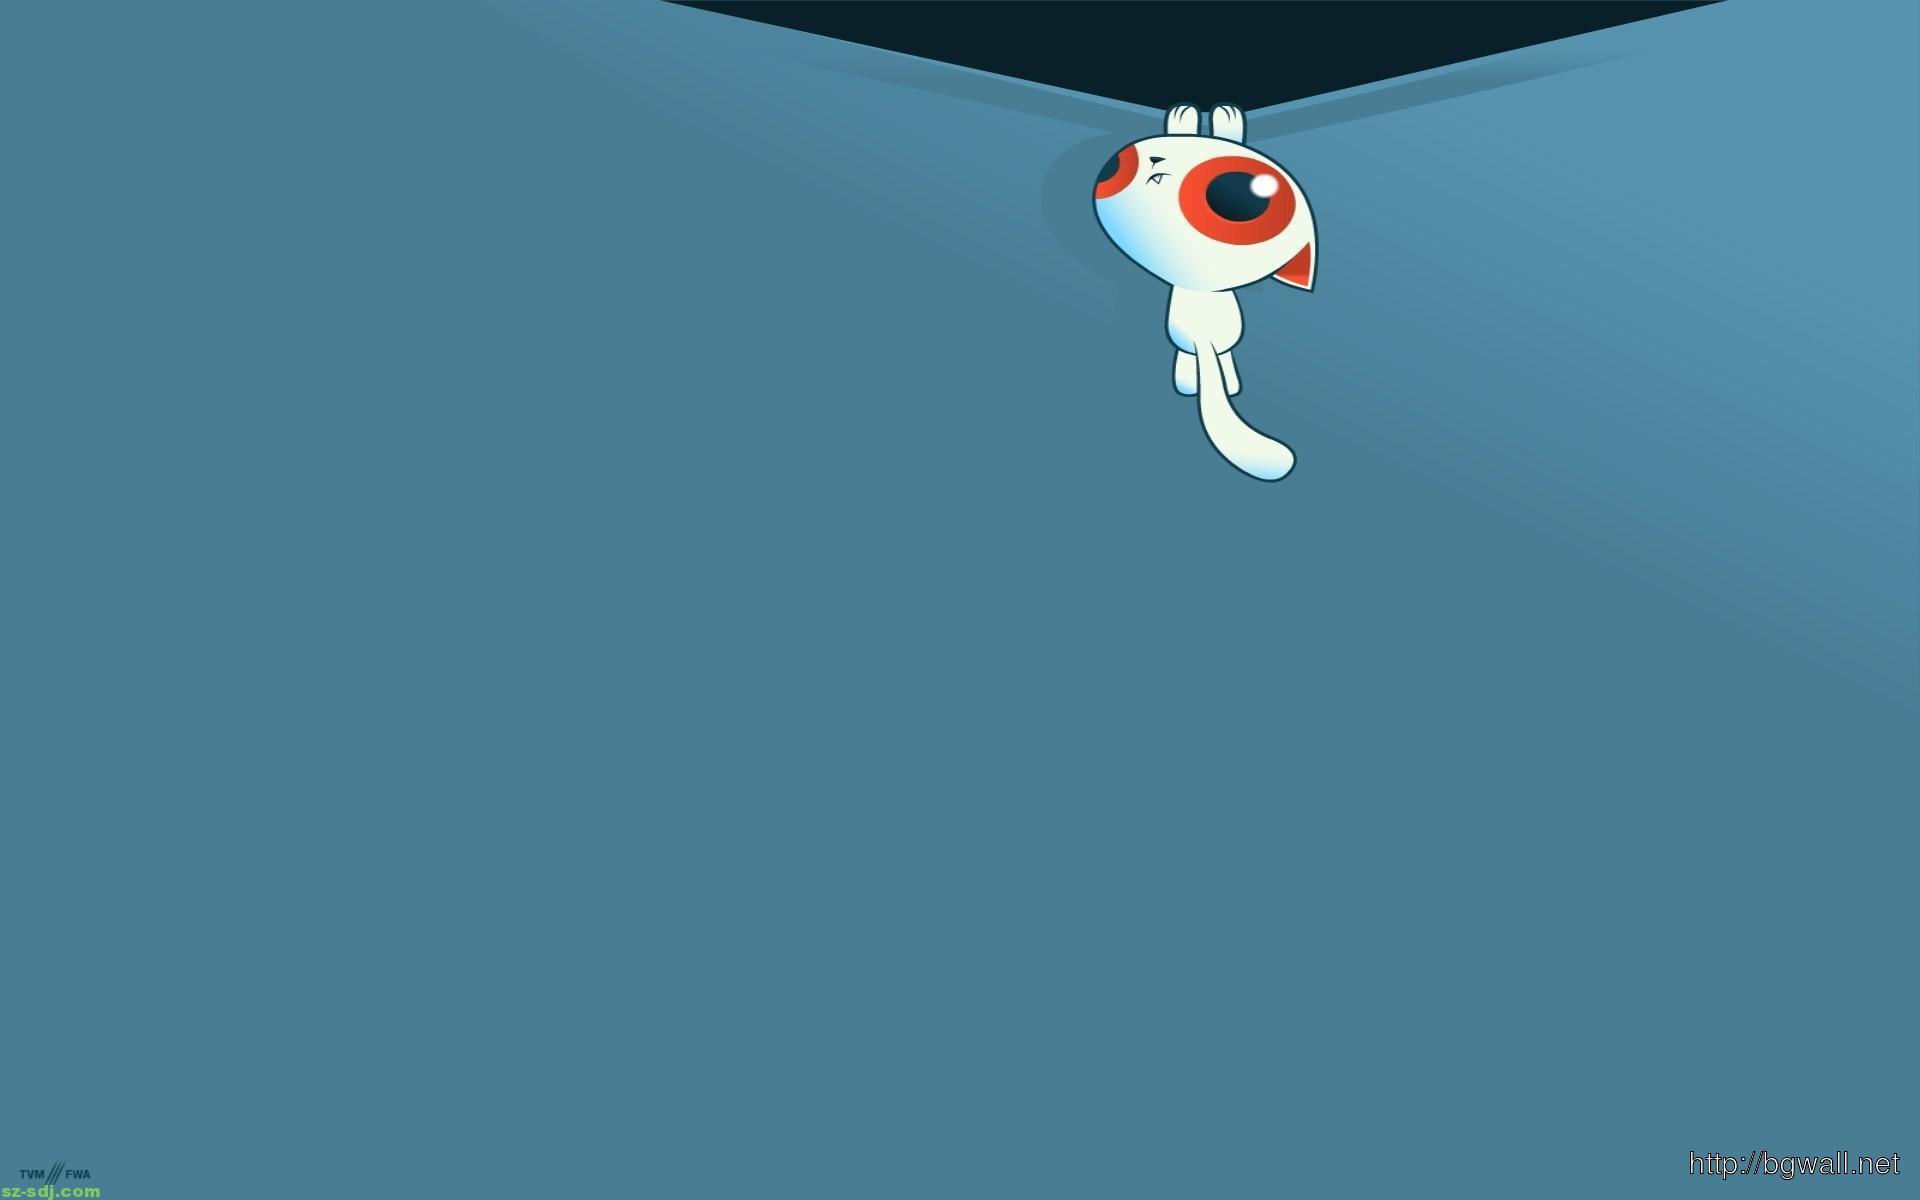 Funny Cartoon Desktop Wallpaper